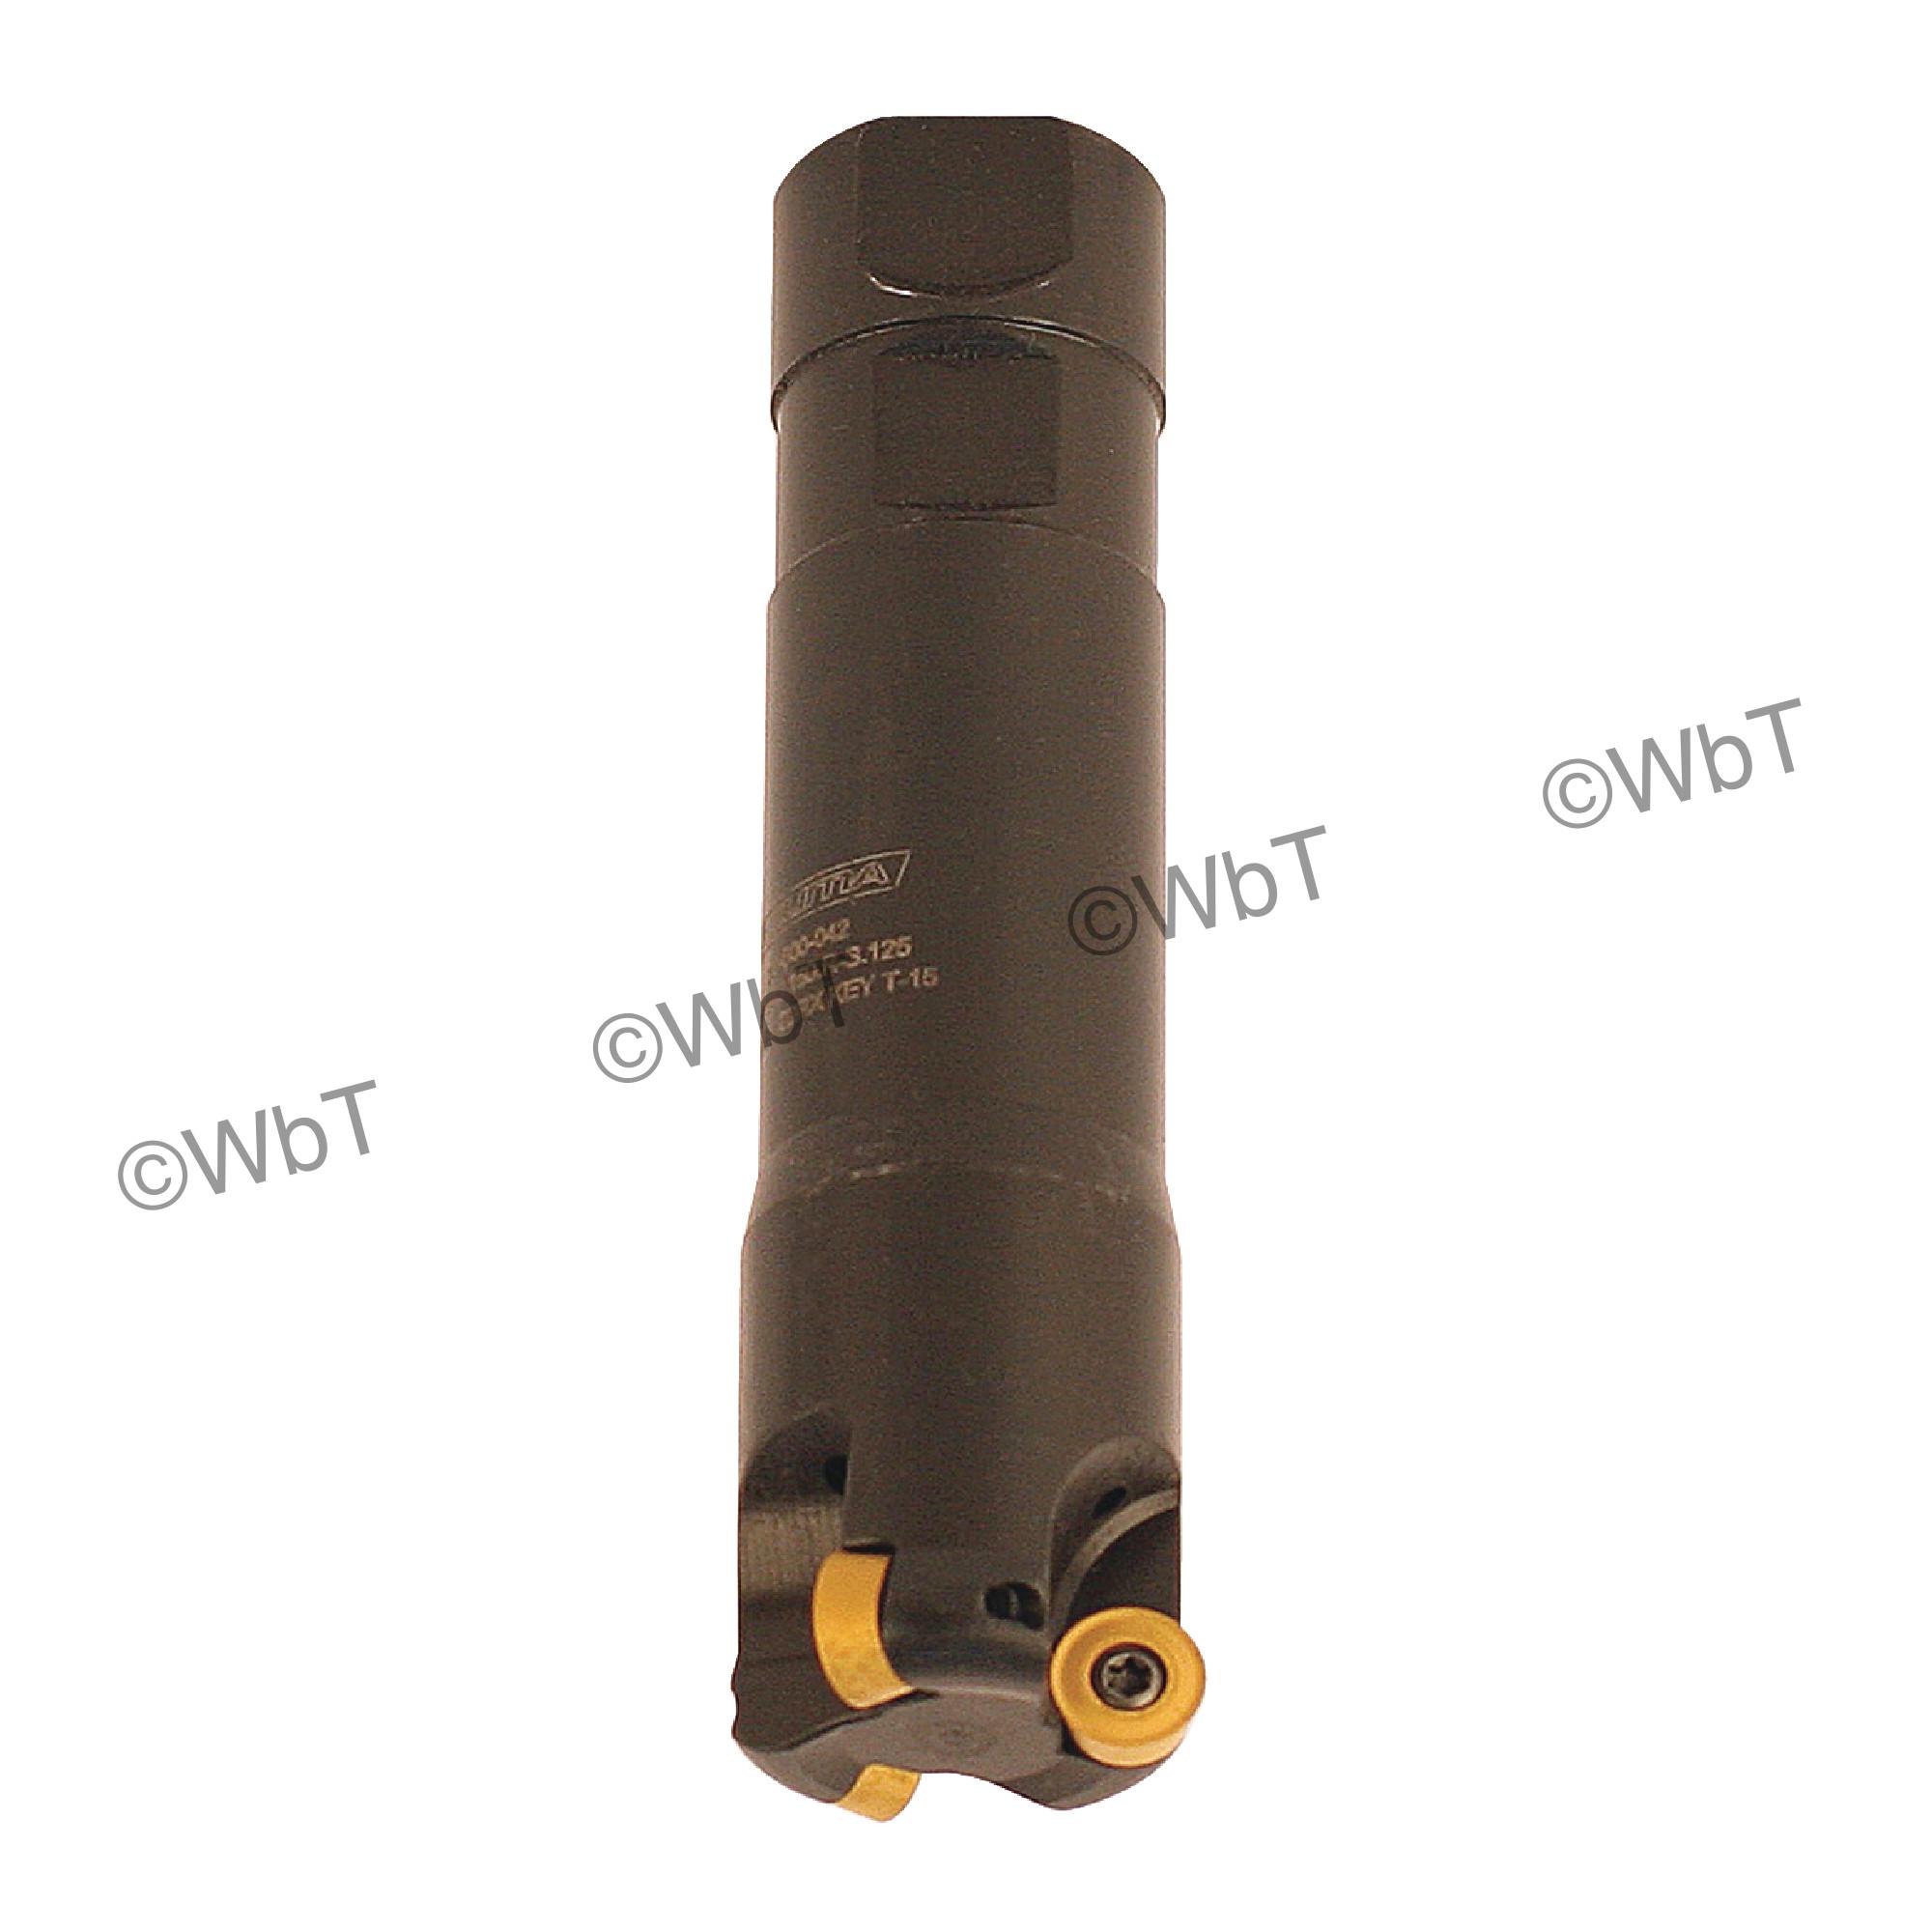 "AKUMA - 1.500"" Endmill Set / Includes: (1) RPS.43.150.R-S.125 (1.5""ø) & (10) RPMT1204M0S-M1 CM30P Coated Inserts"